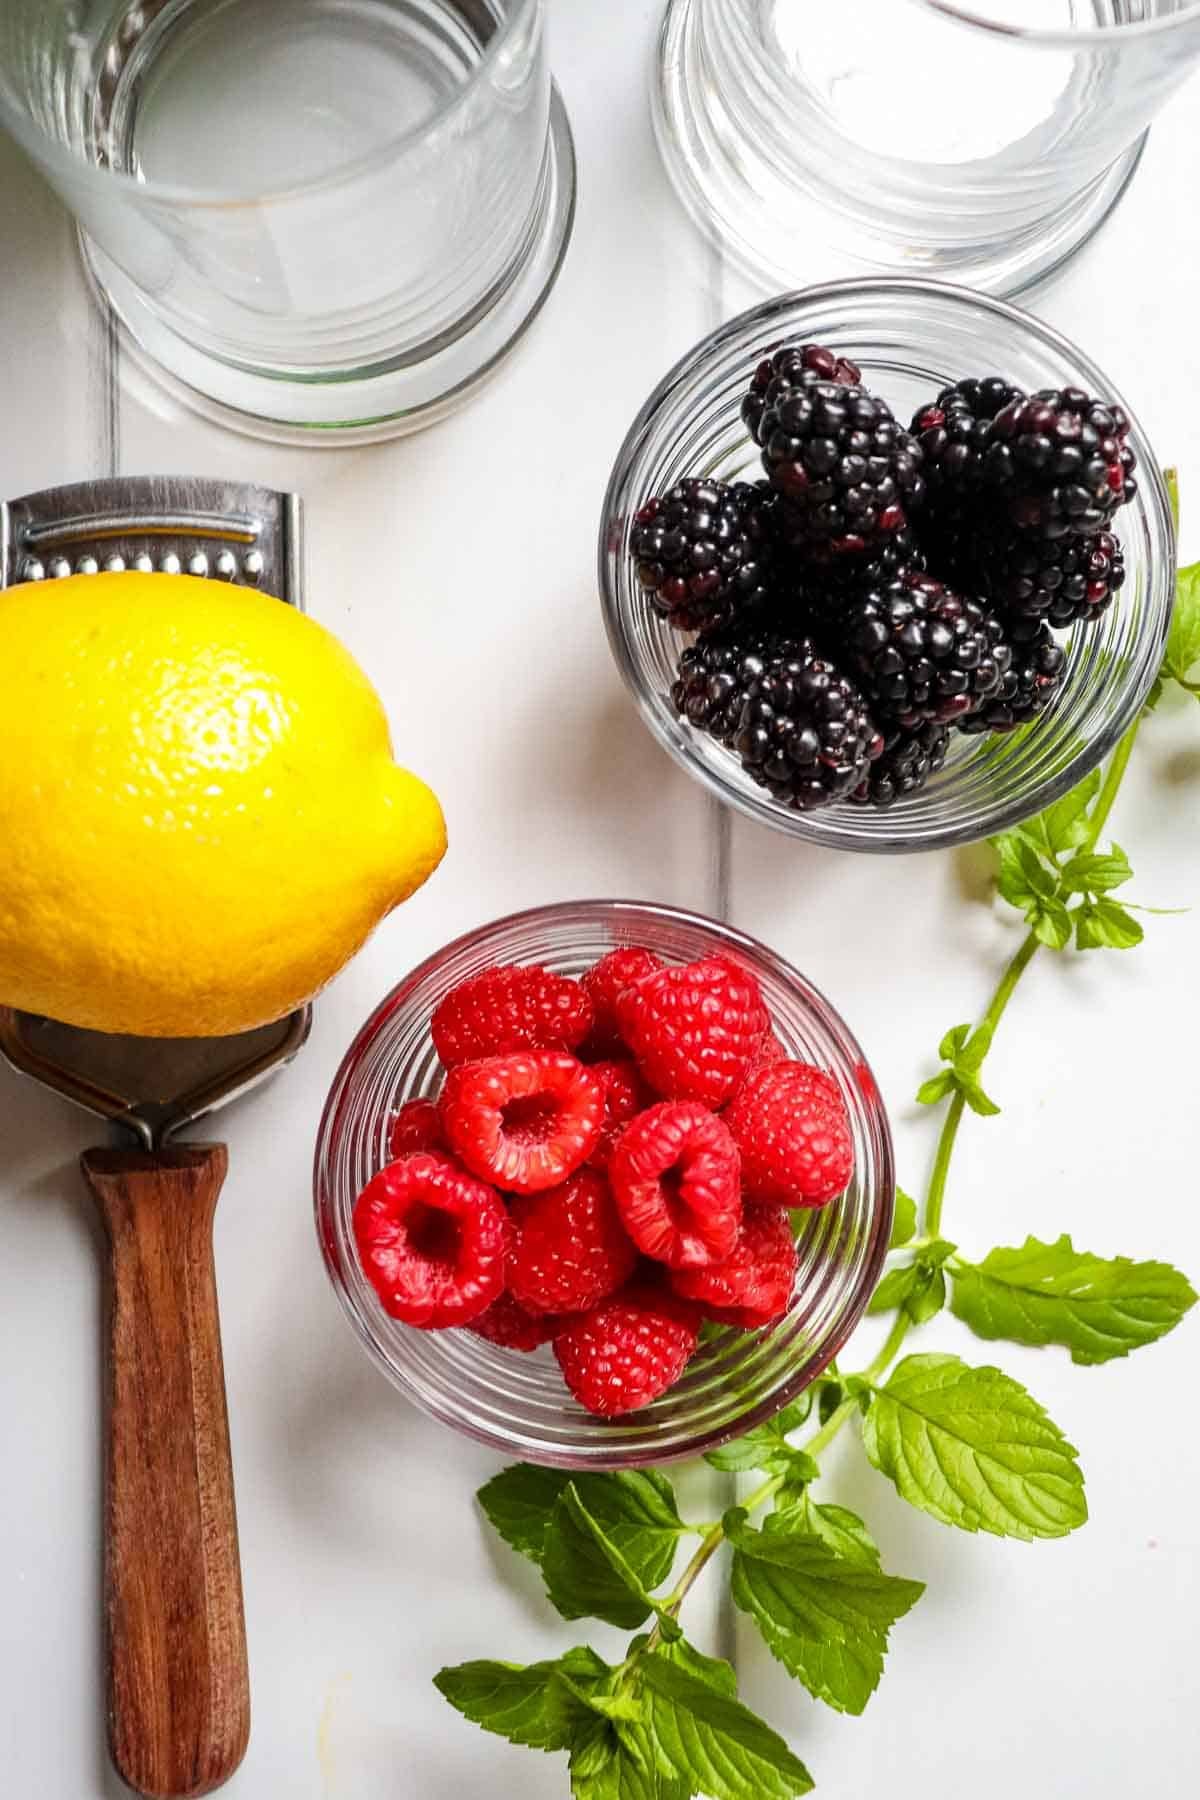 Ingredients to make berry spritzers.